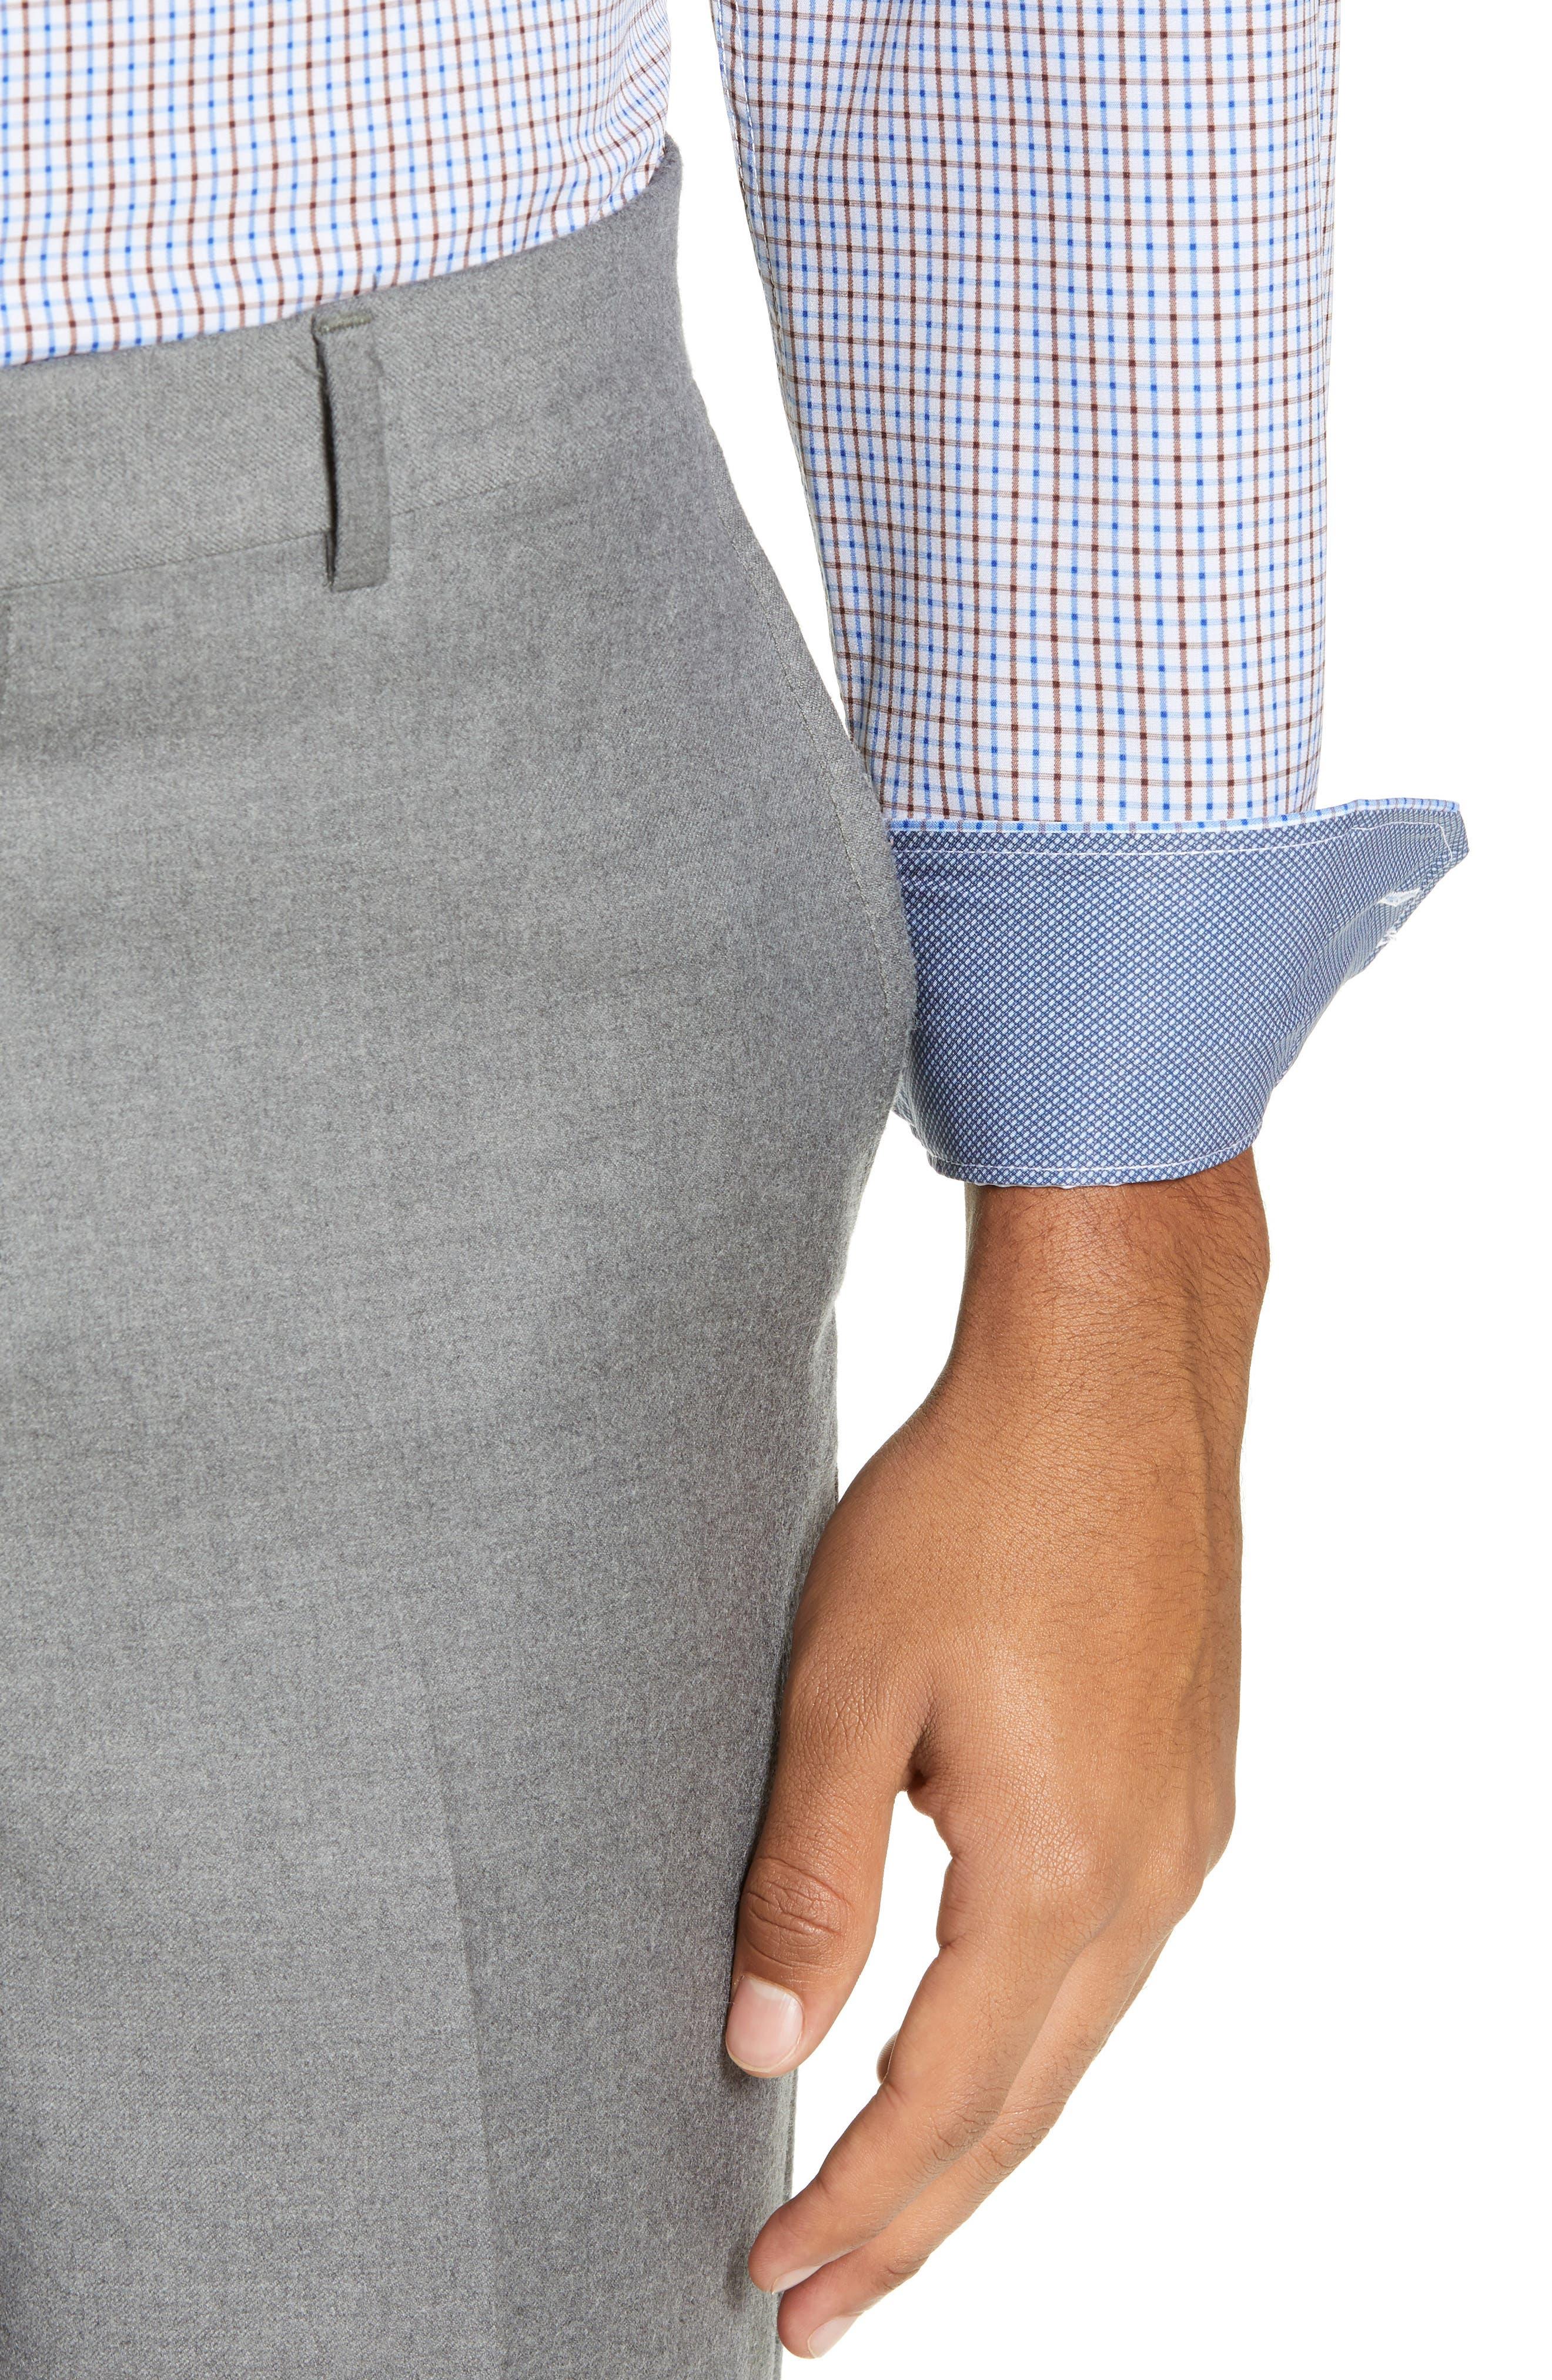 Trim Fit 4-Way Stretch Check Dress Shirt,                             Alternate thumbnail 2, color,                             BLUE